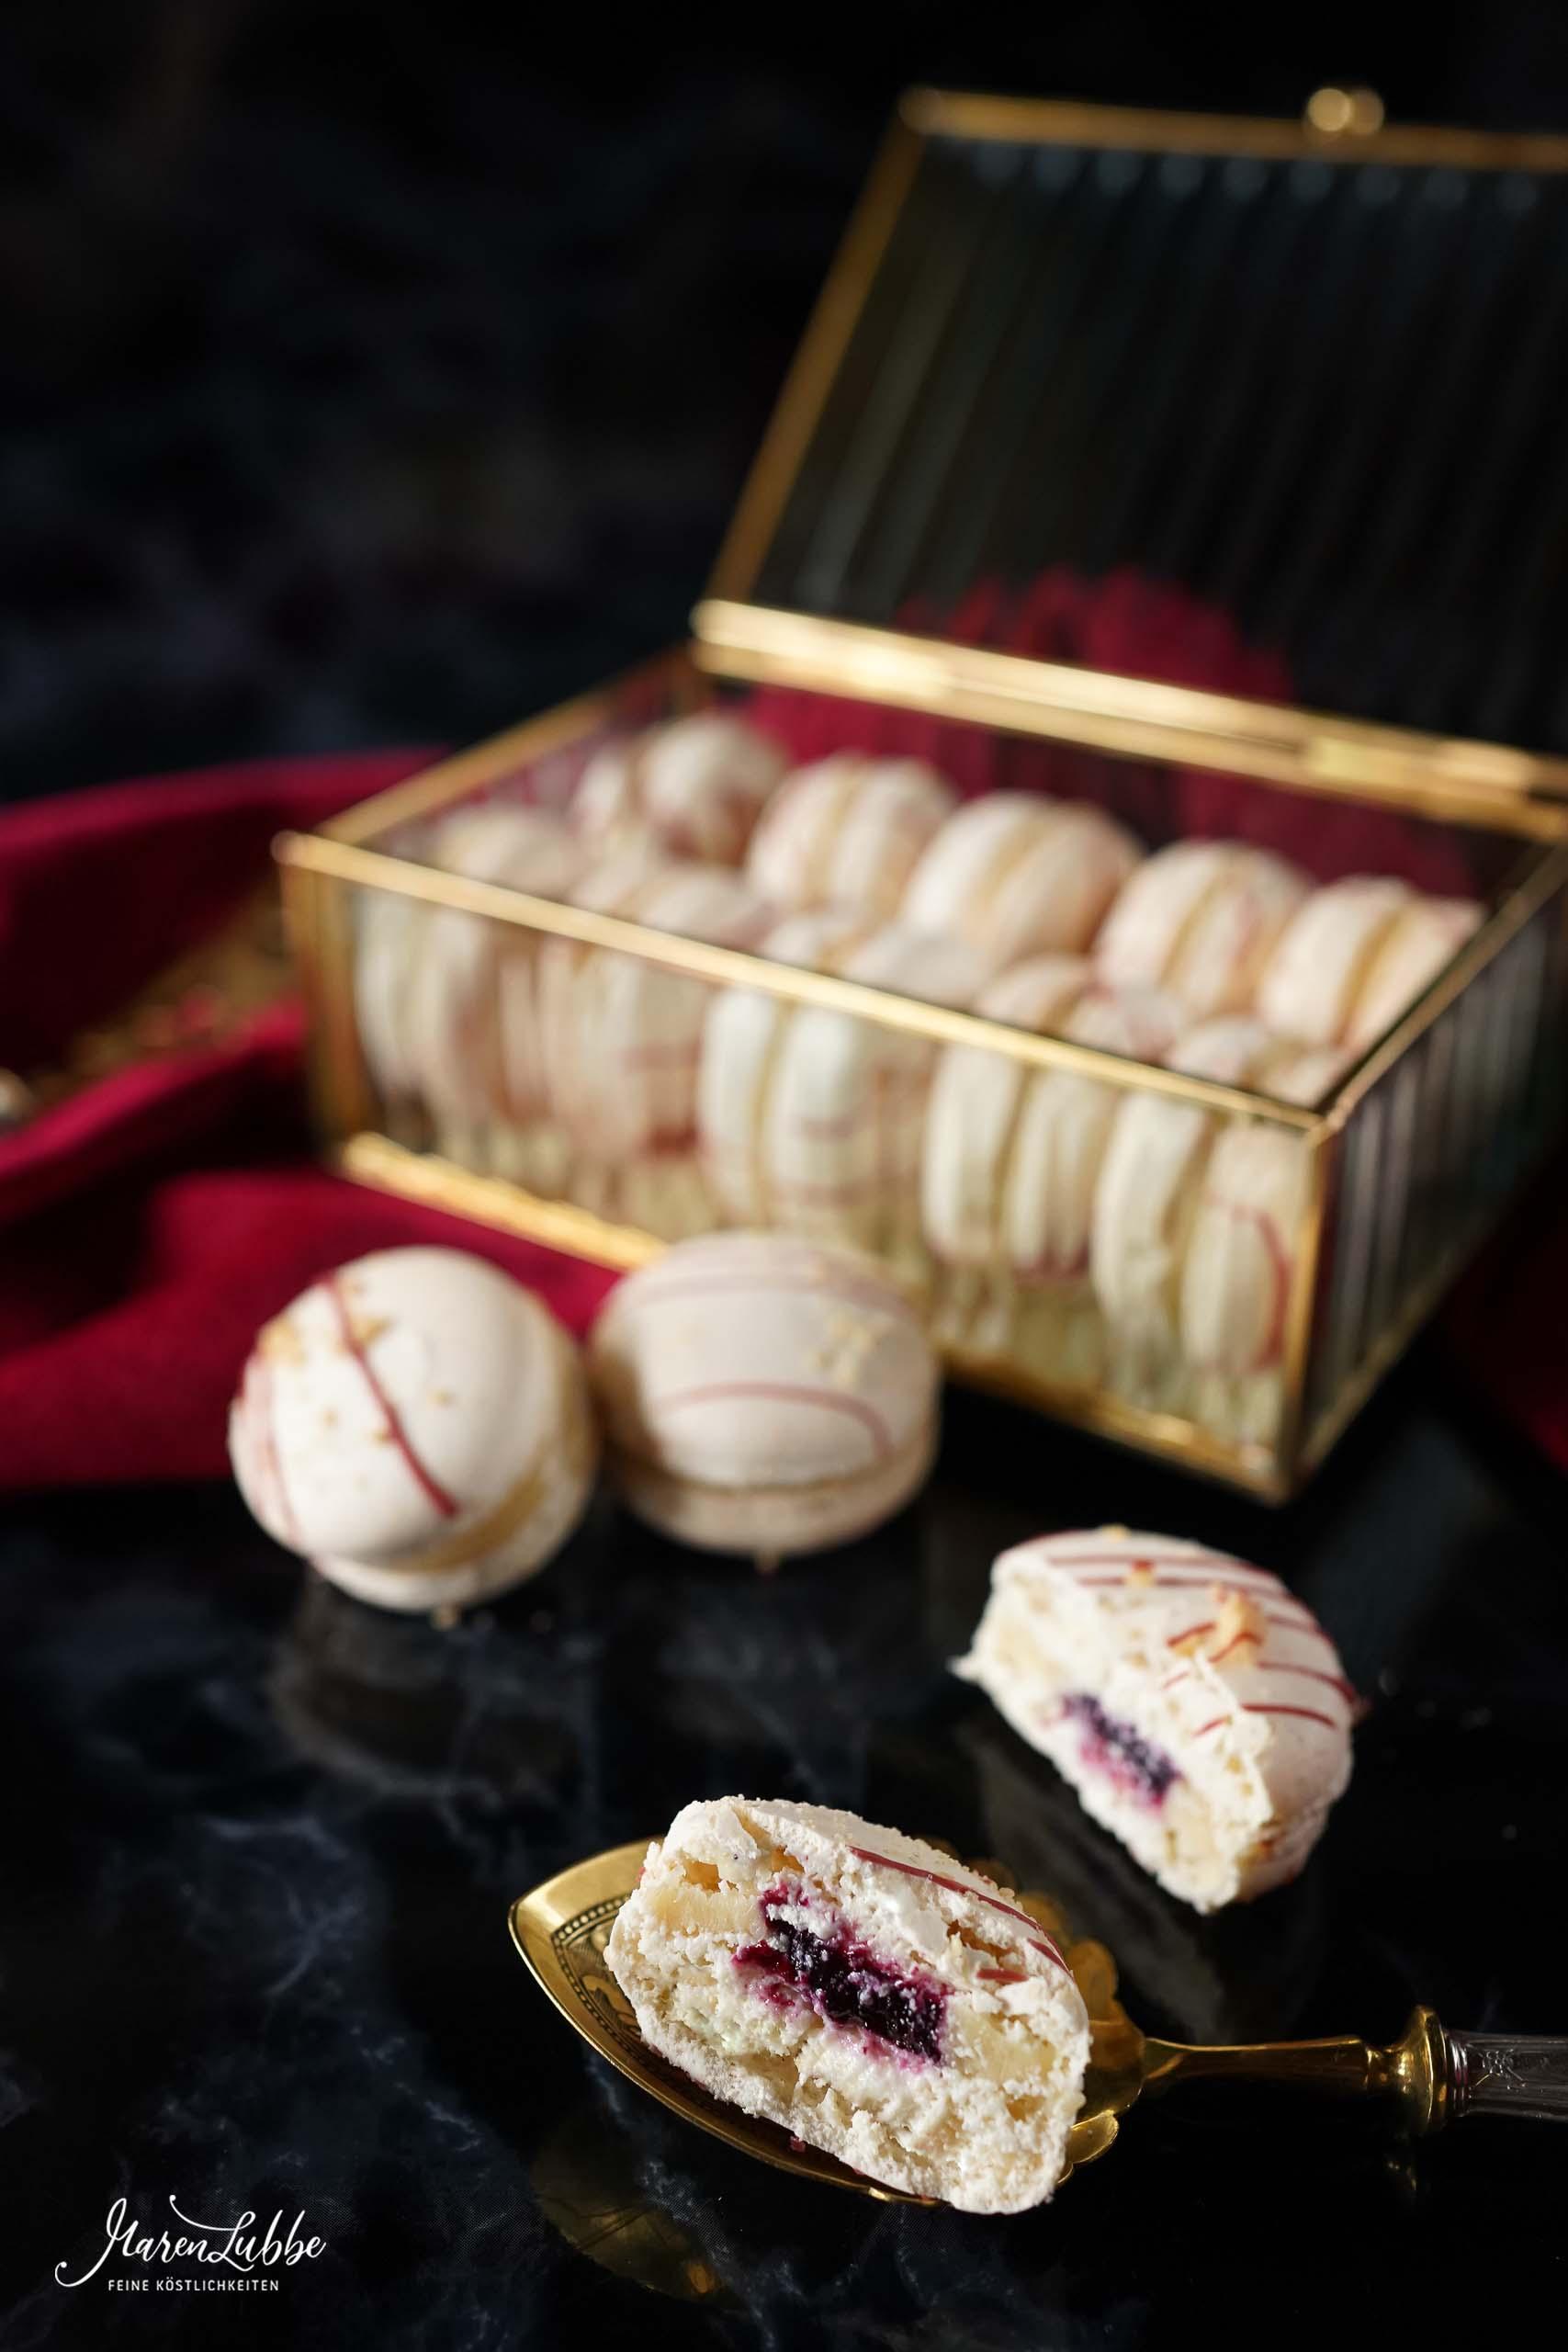 Erdnuss-Cassis Macarons